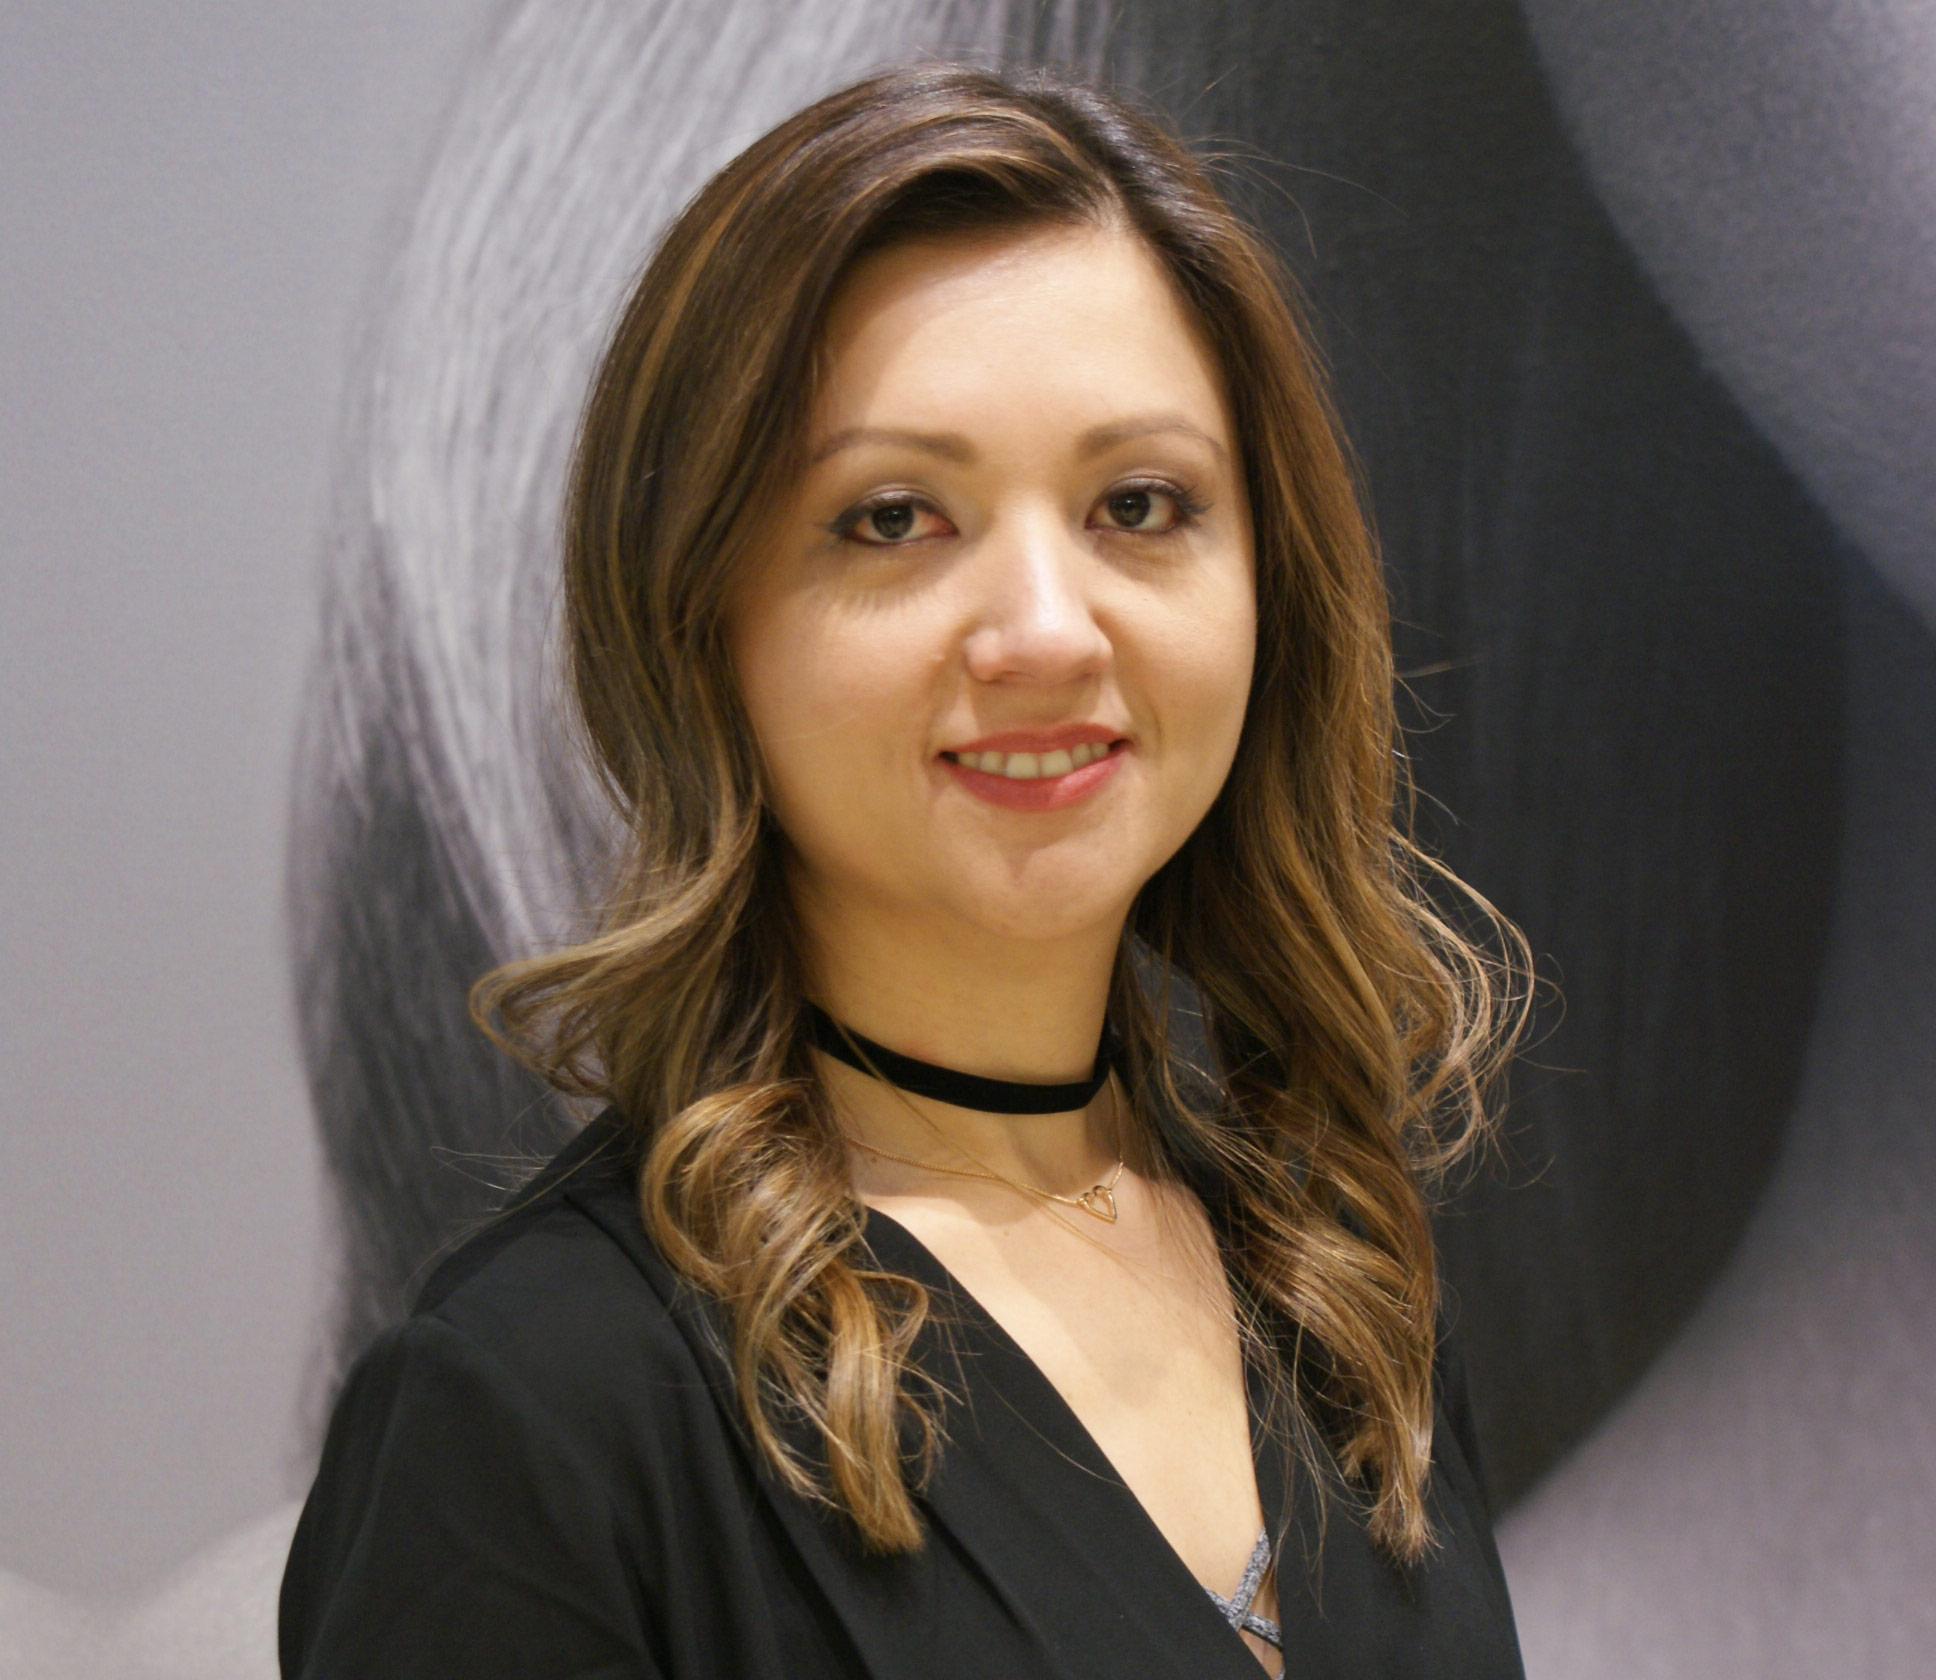 Olga-Hernandez-Cosimos-Salon-Burlington